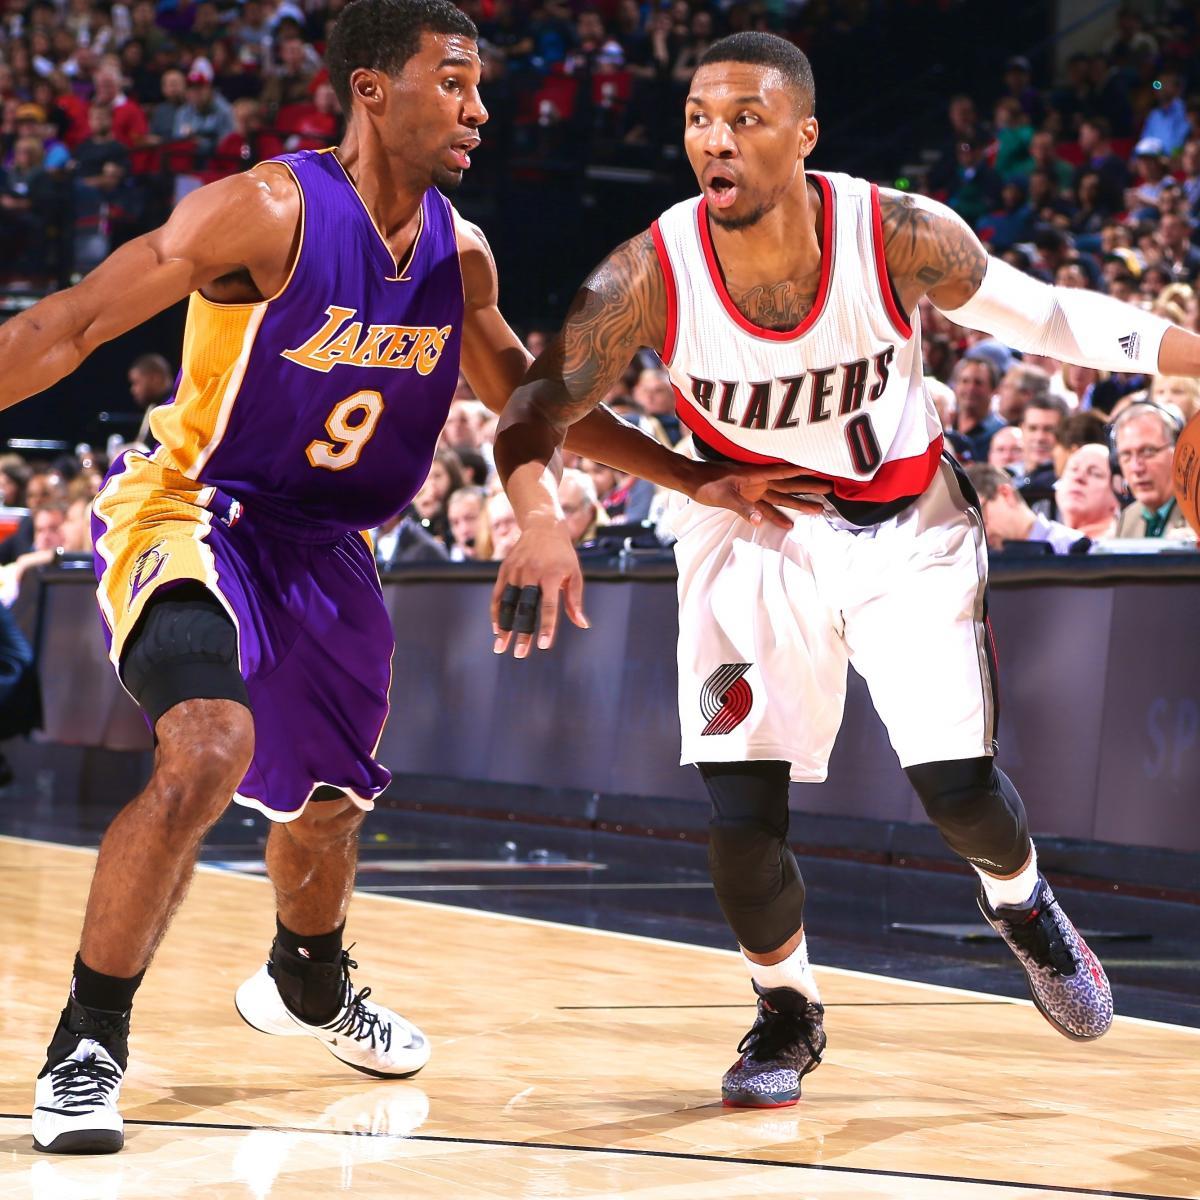 Blazers Vs Lakers: Los Angeles Lakers Vs. Portland Trail Blazers: Live Score